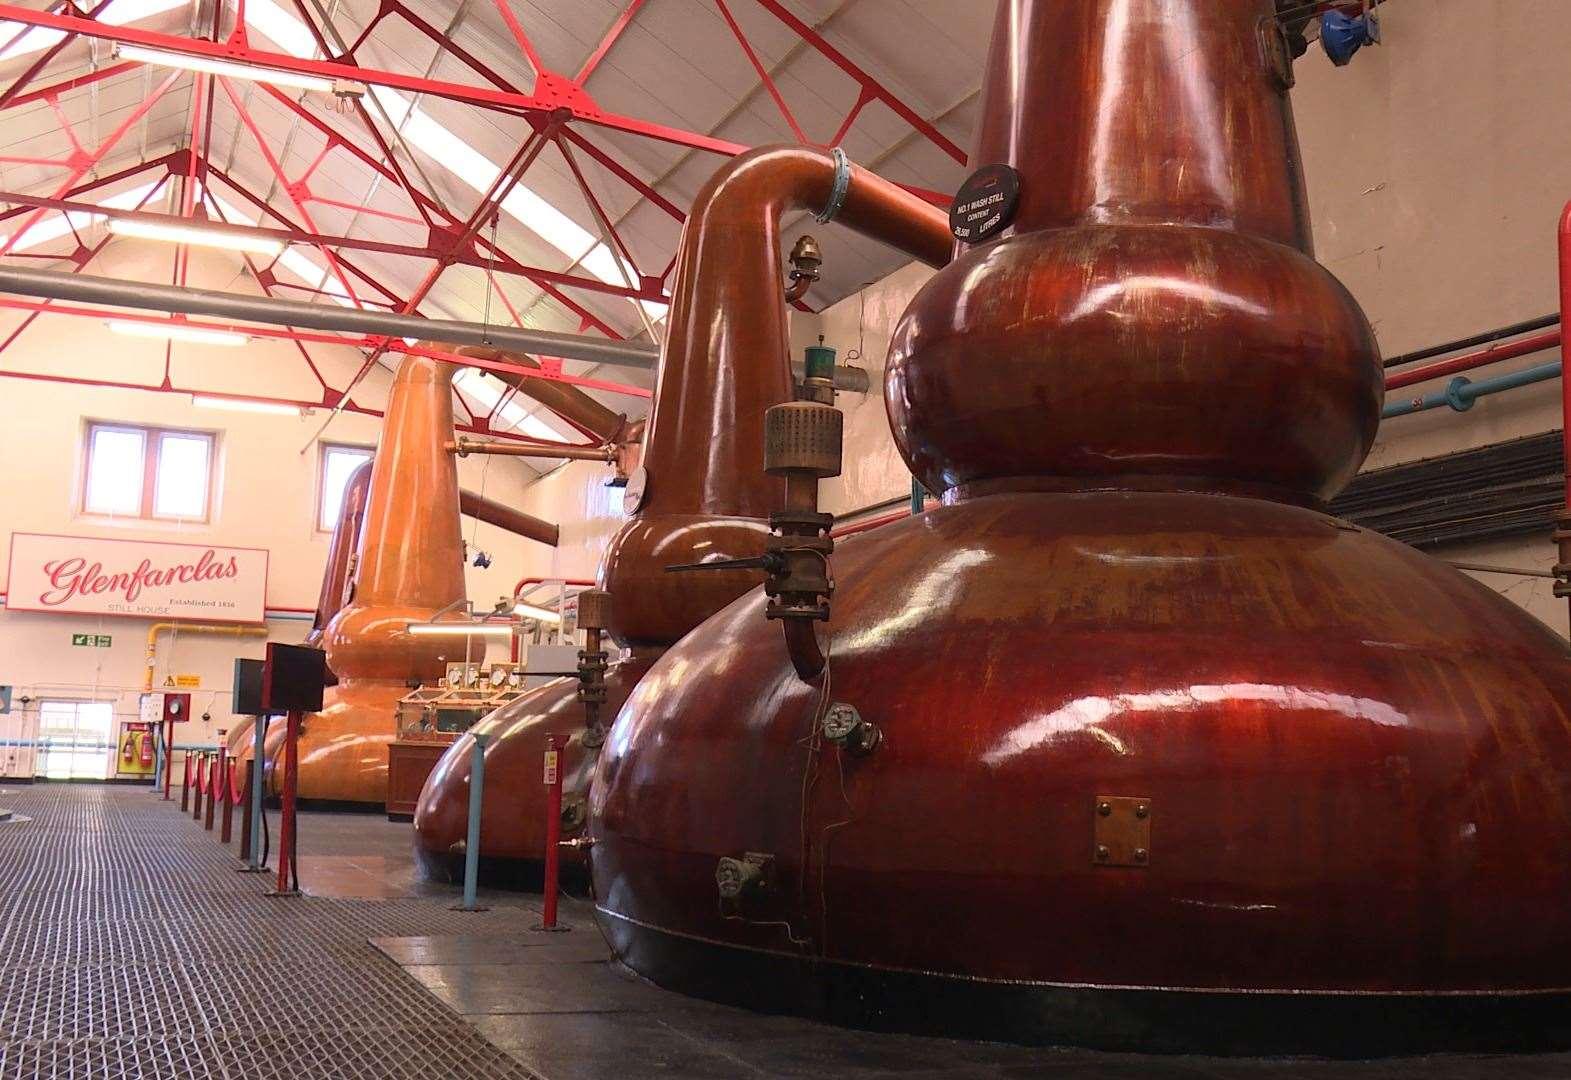 Local Distillery To Feature On Stv Tonight photo